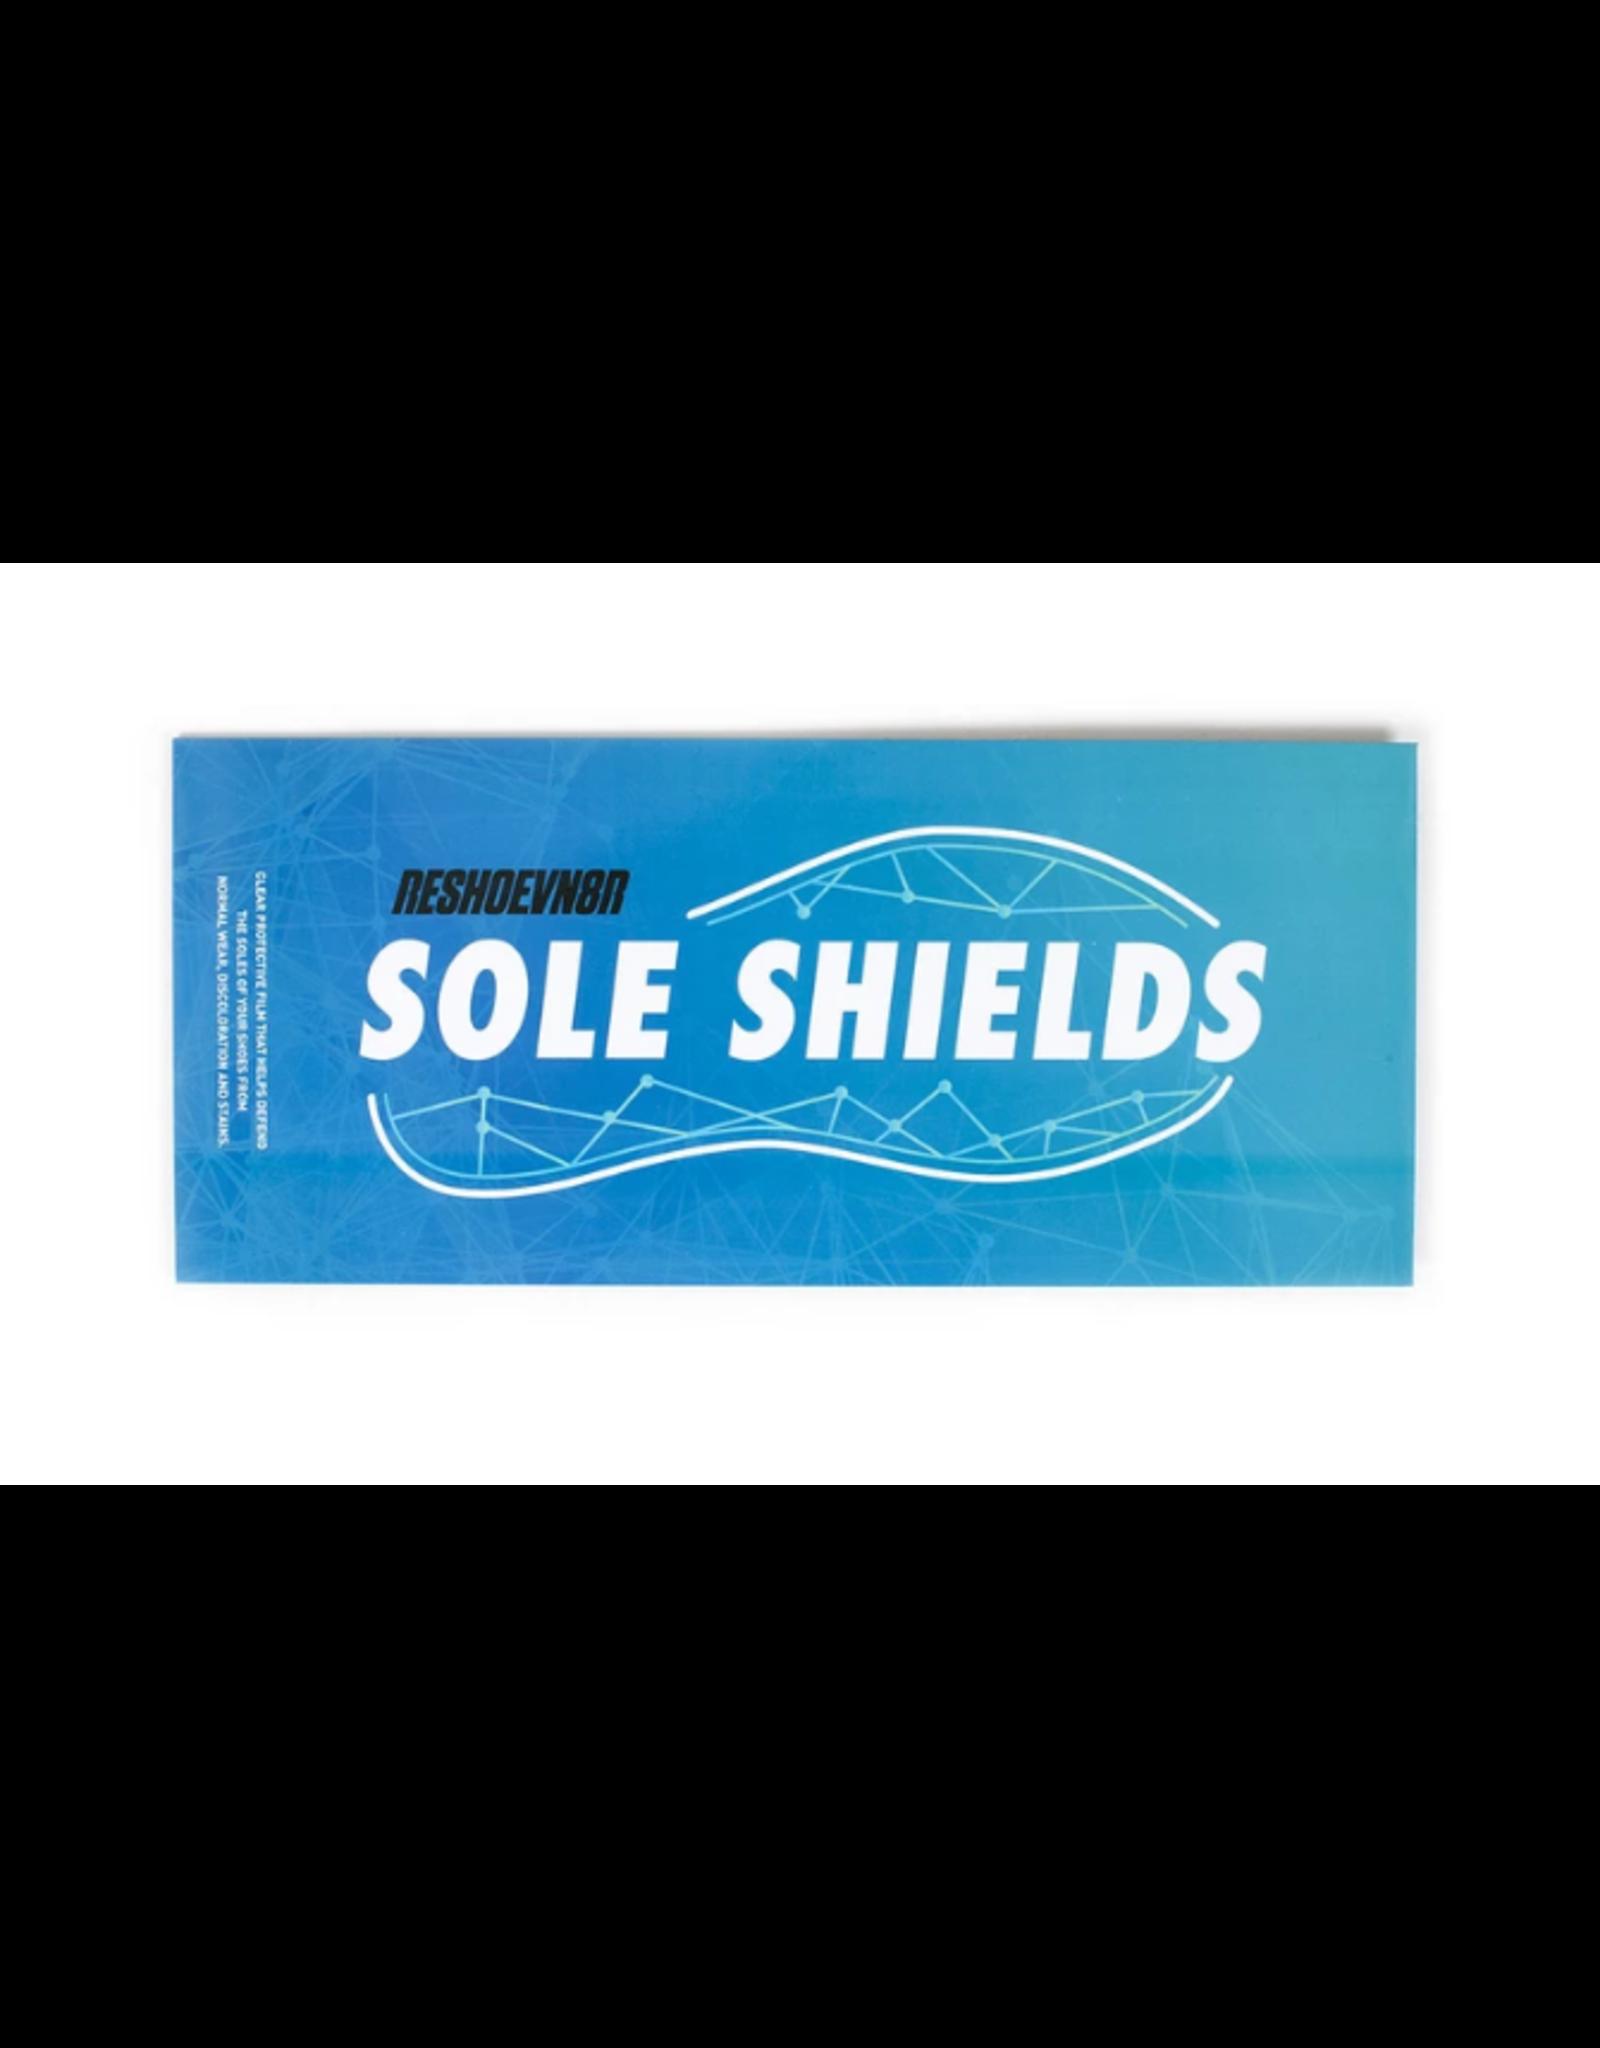 RESHOEVN8R RESHOEVN8R SOLE SHIELDS